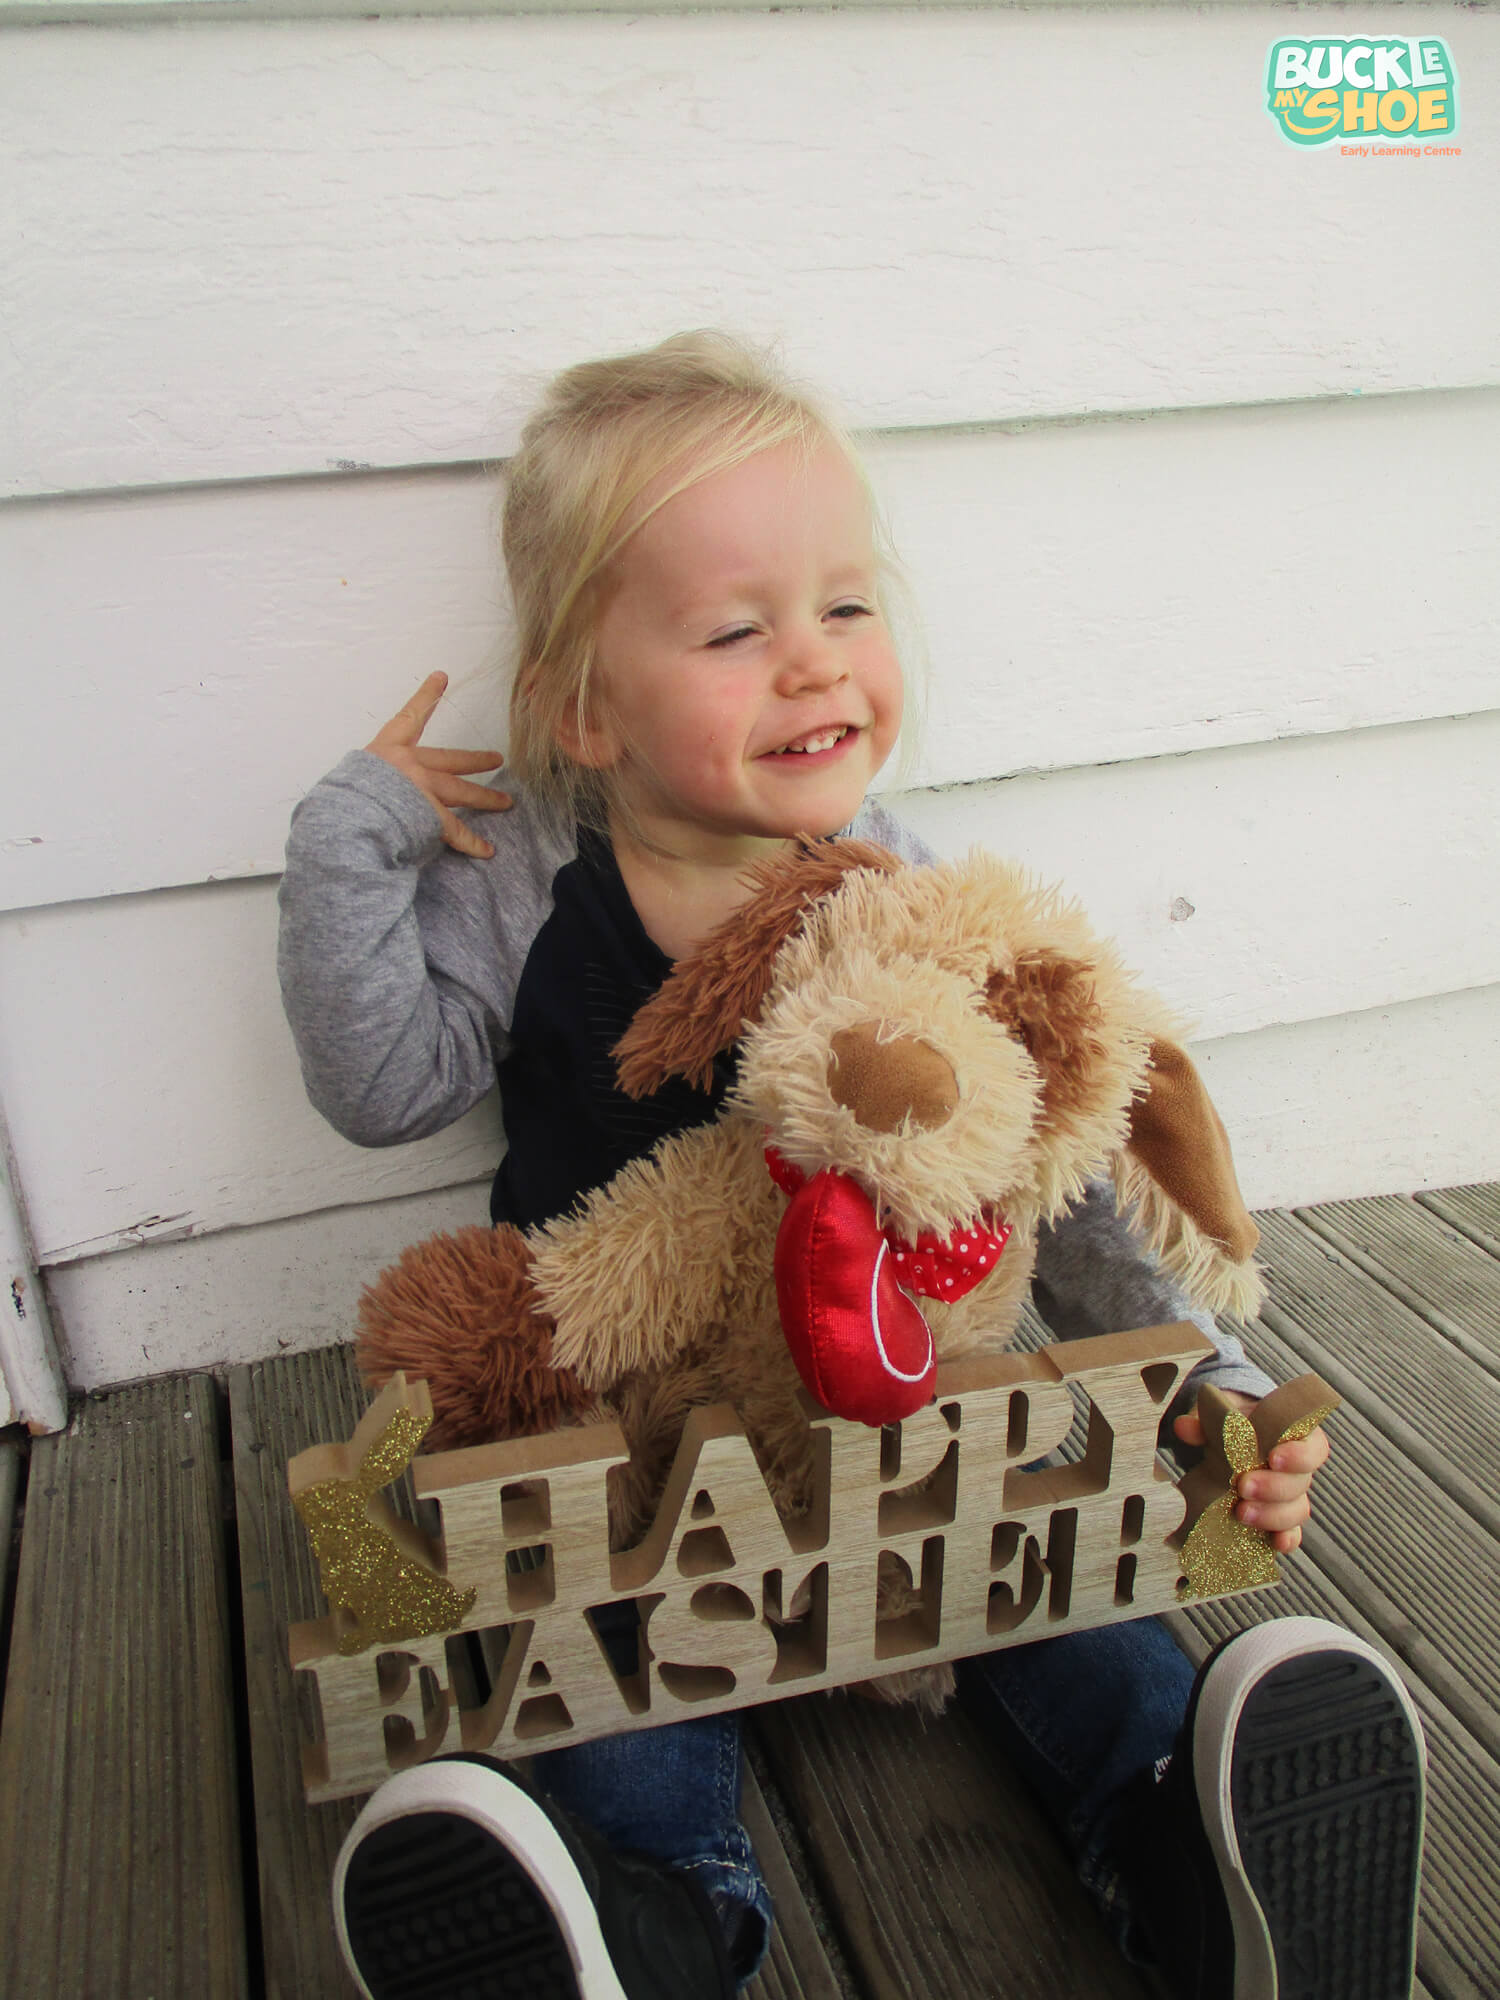 buckle-my-shoe-childcare-tauranga-easter-3.jpg